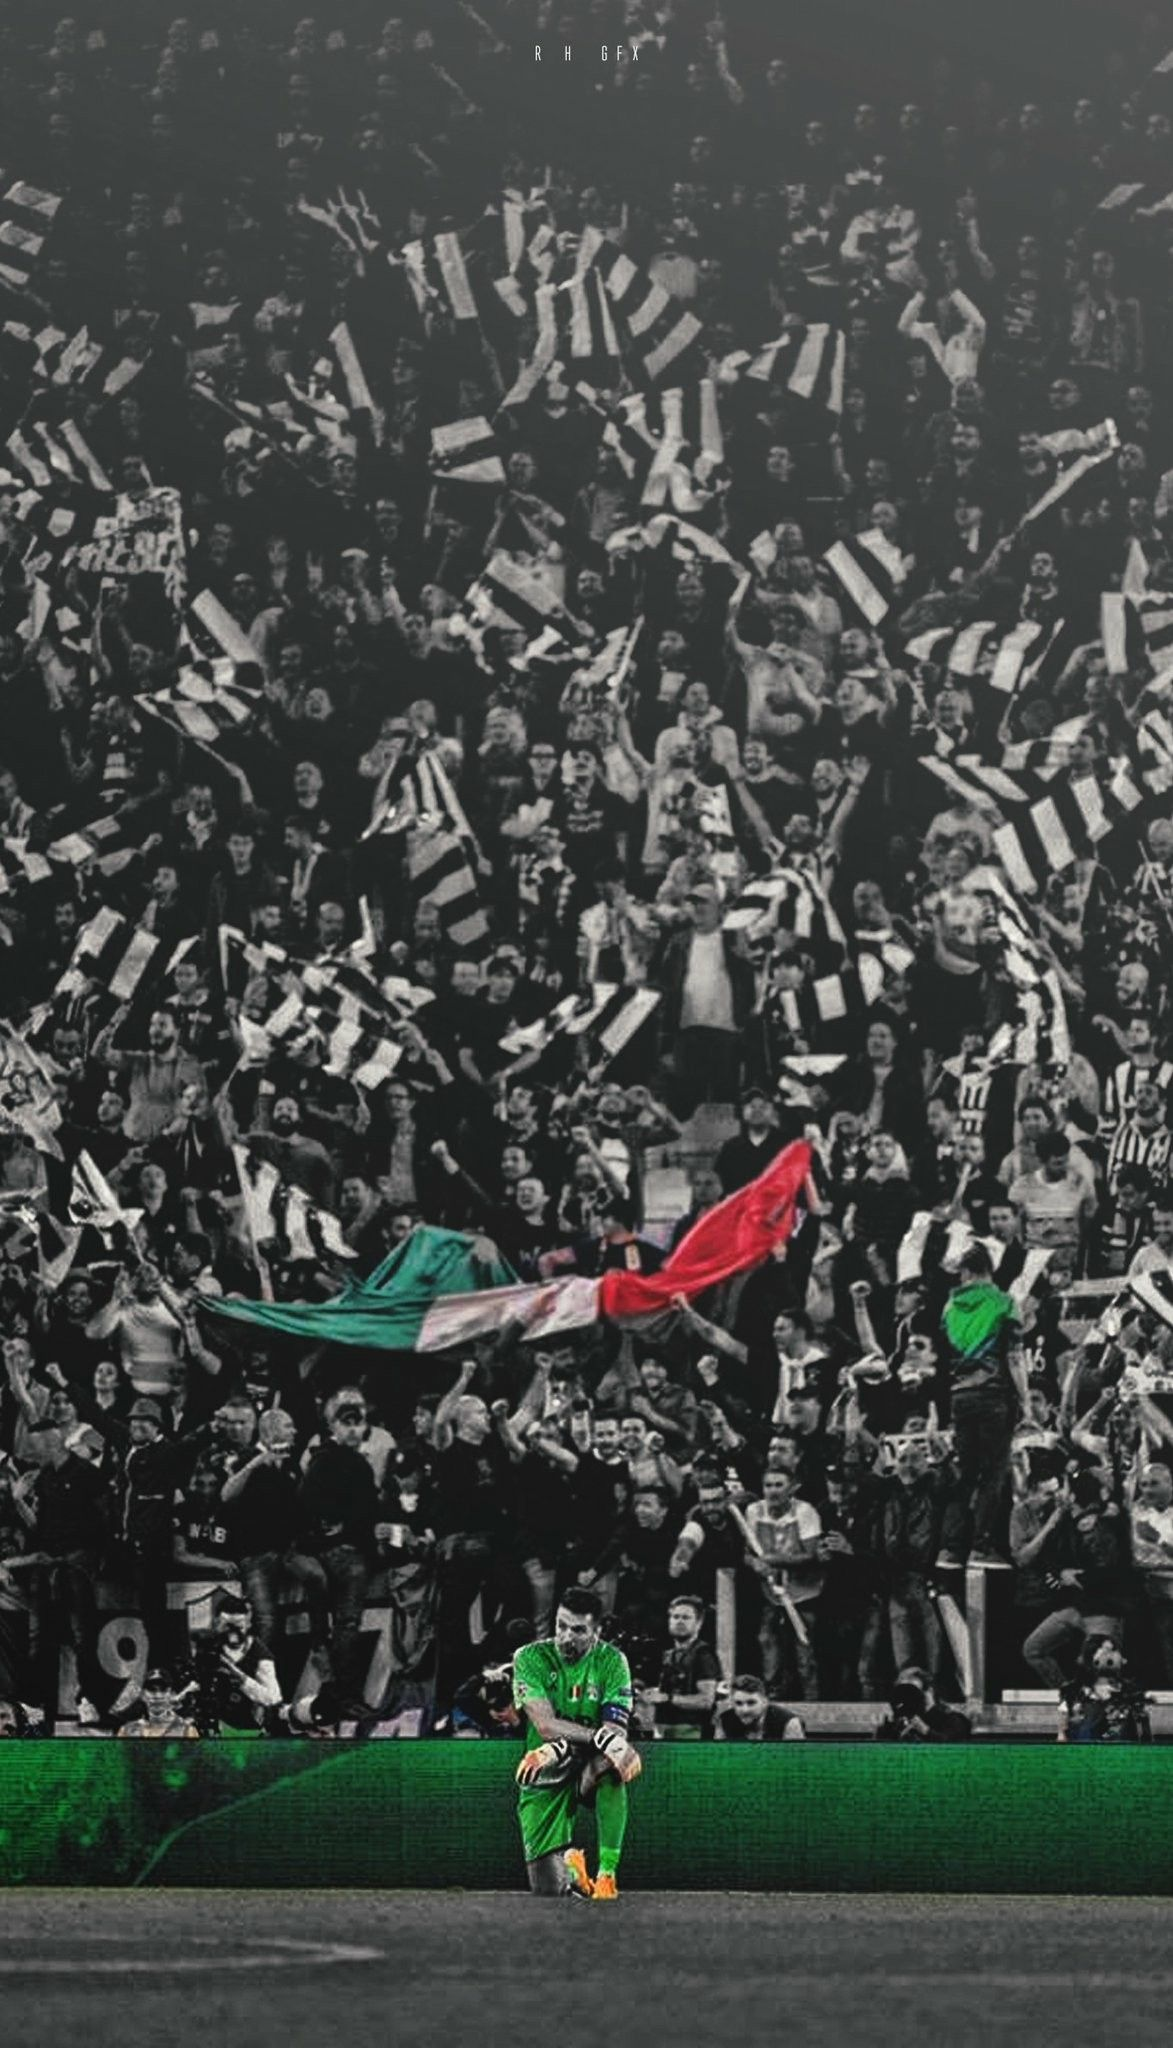 juventus fan on stadium 1173x2048 wallpaper teahub io juventus fan on stadium 1173x2048